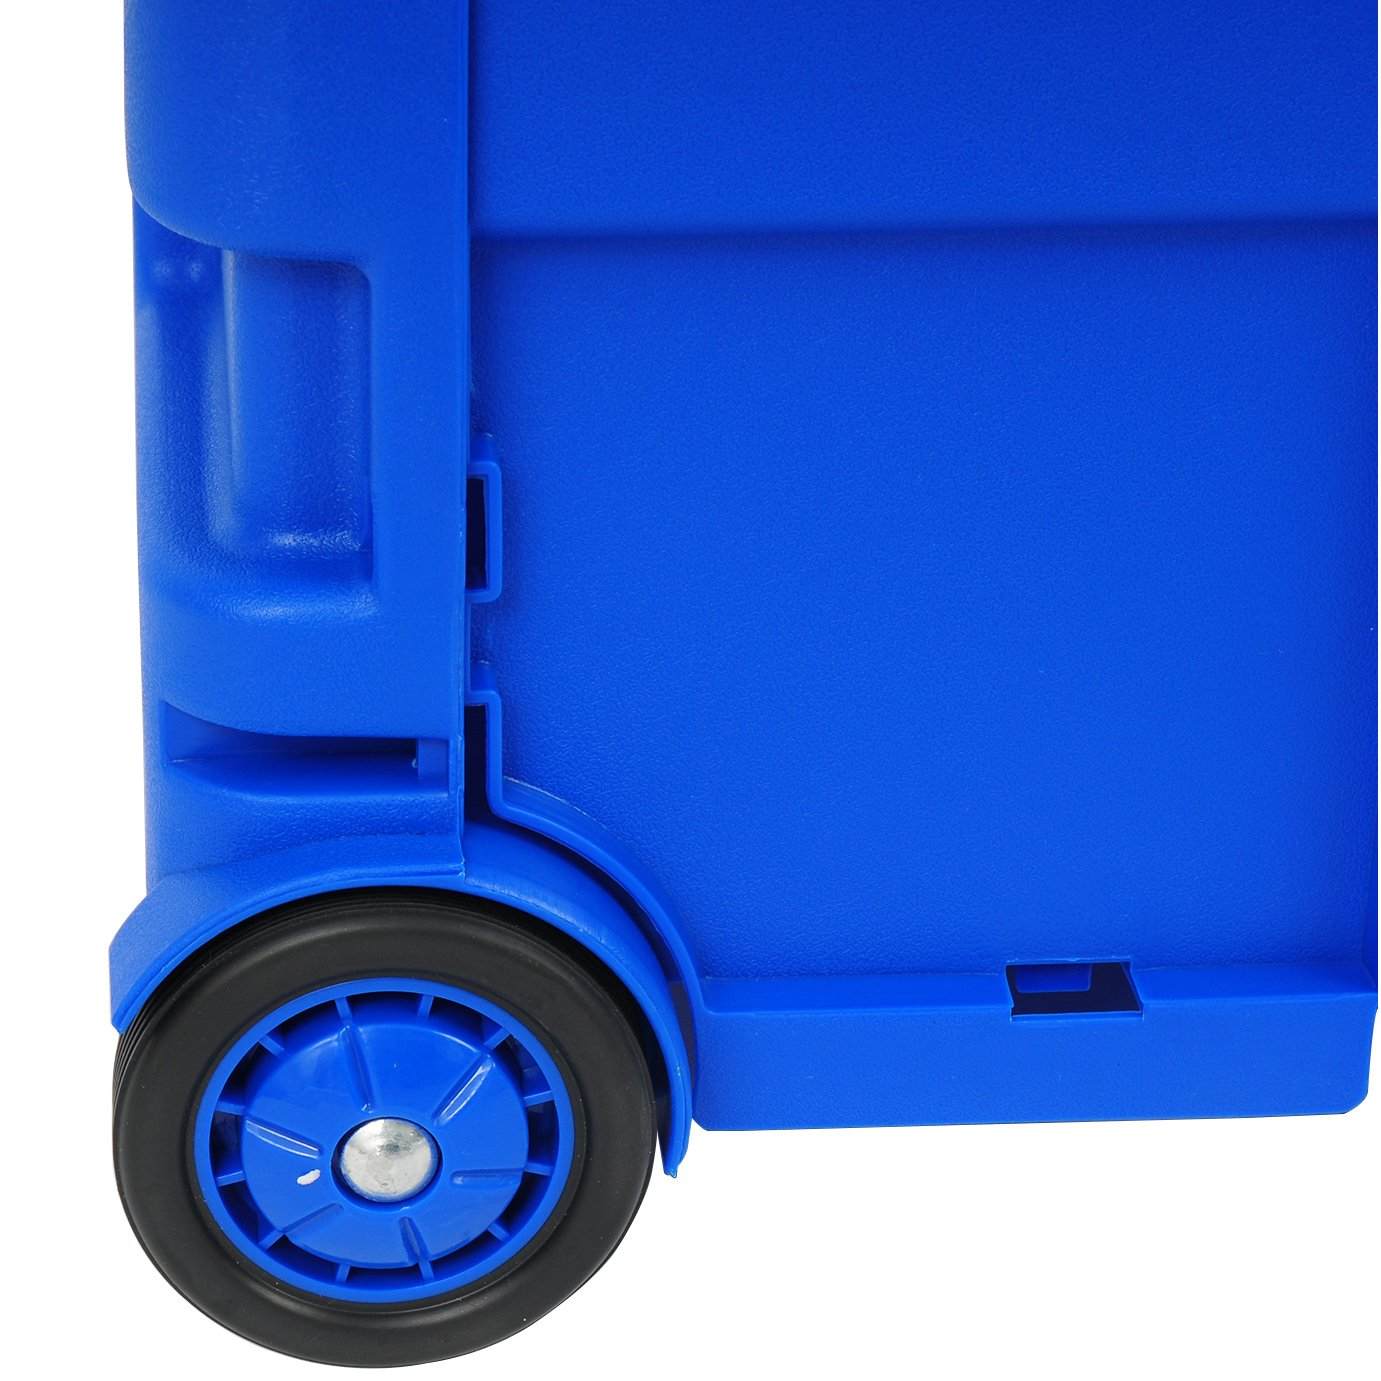 WOLTU 2x Carritos de Compra Carrito de transporte Plegable Capacidad de 35 kg 64L 42 x 40,5 x 38 cm ABS//Acero Inoxidable Azul EW4805bl-2